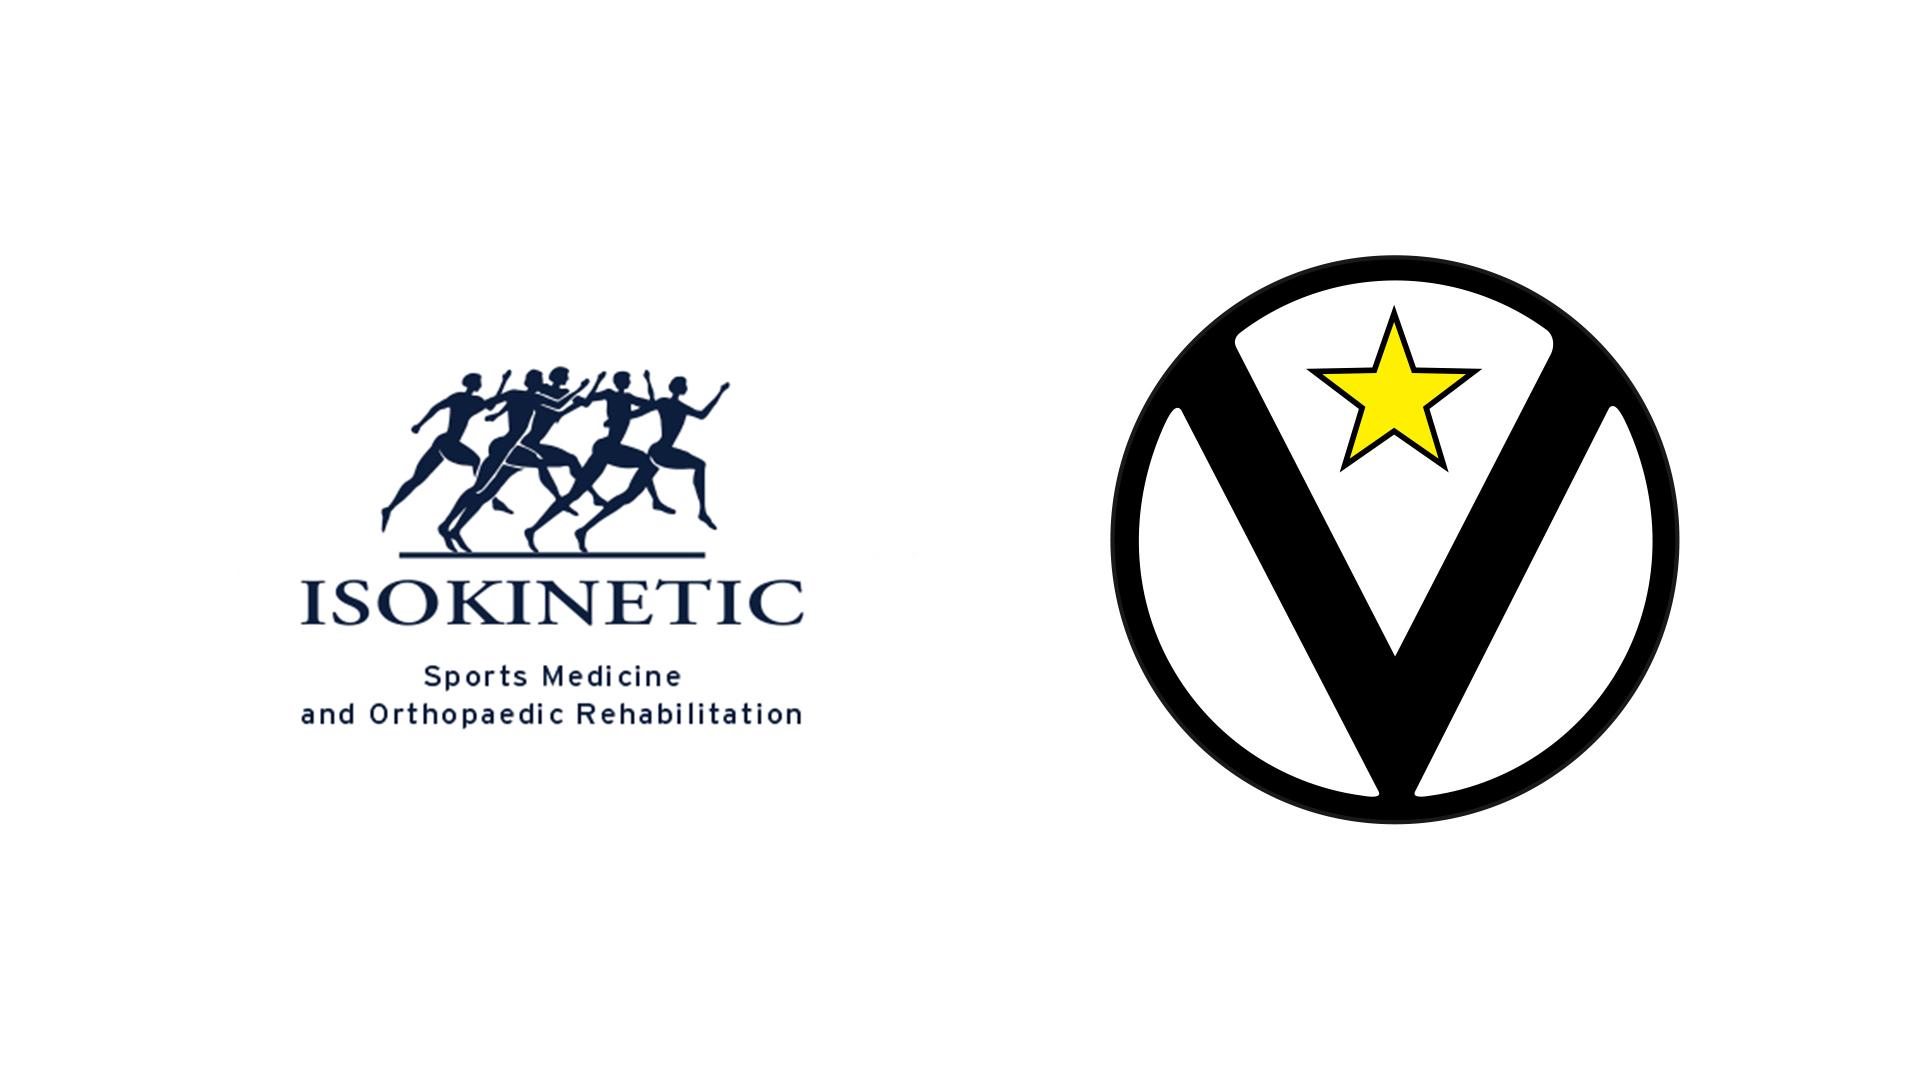 Isokinetic Bologna rinnova la partnership con la Virtus